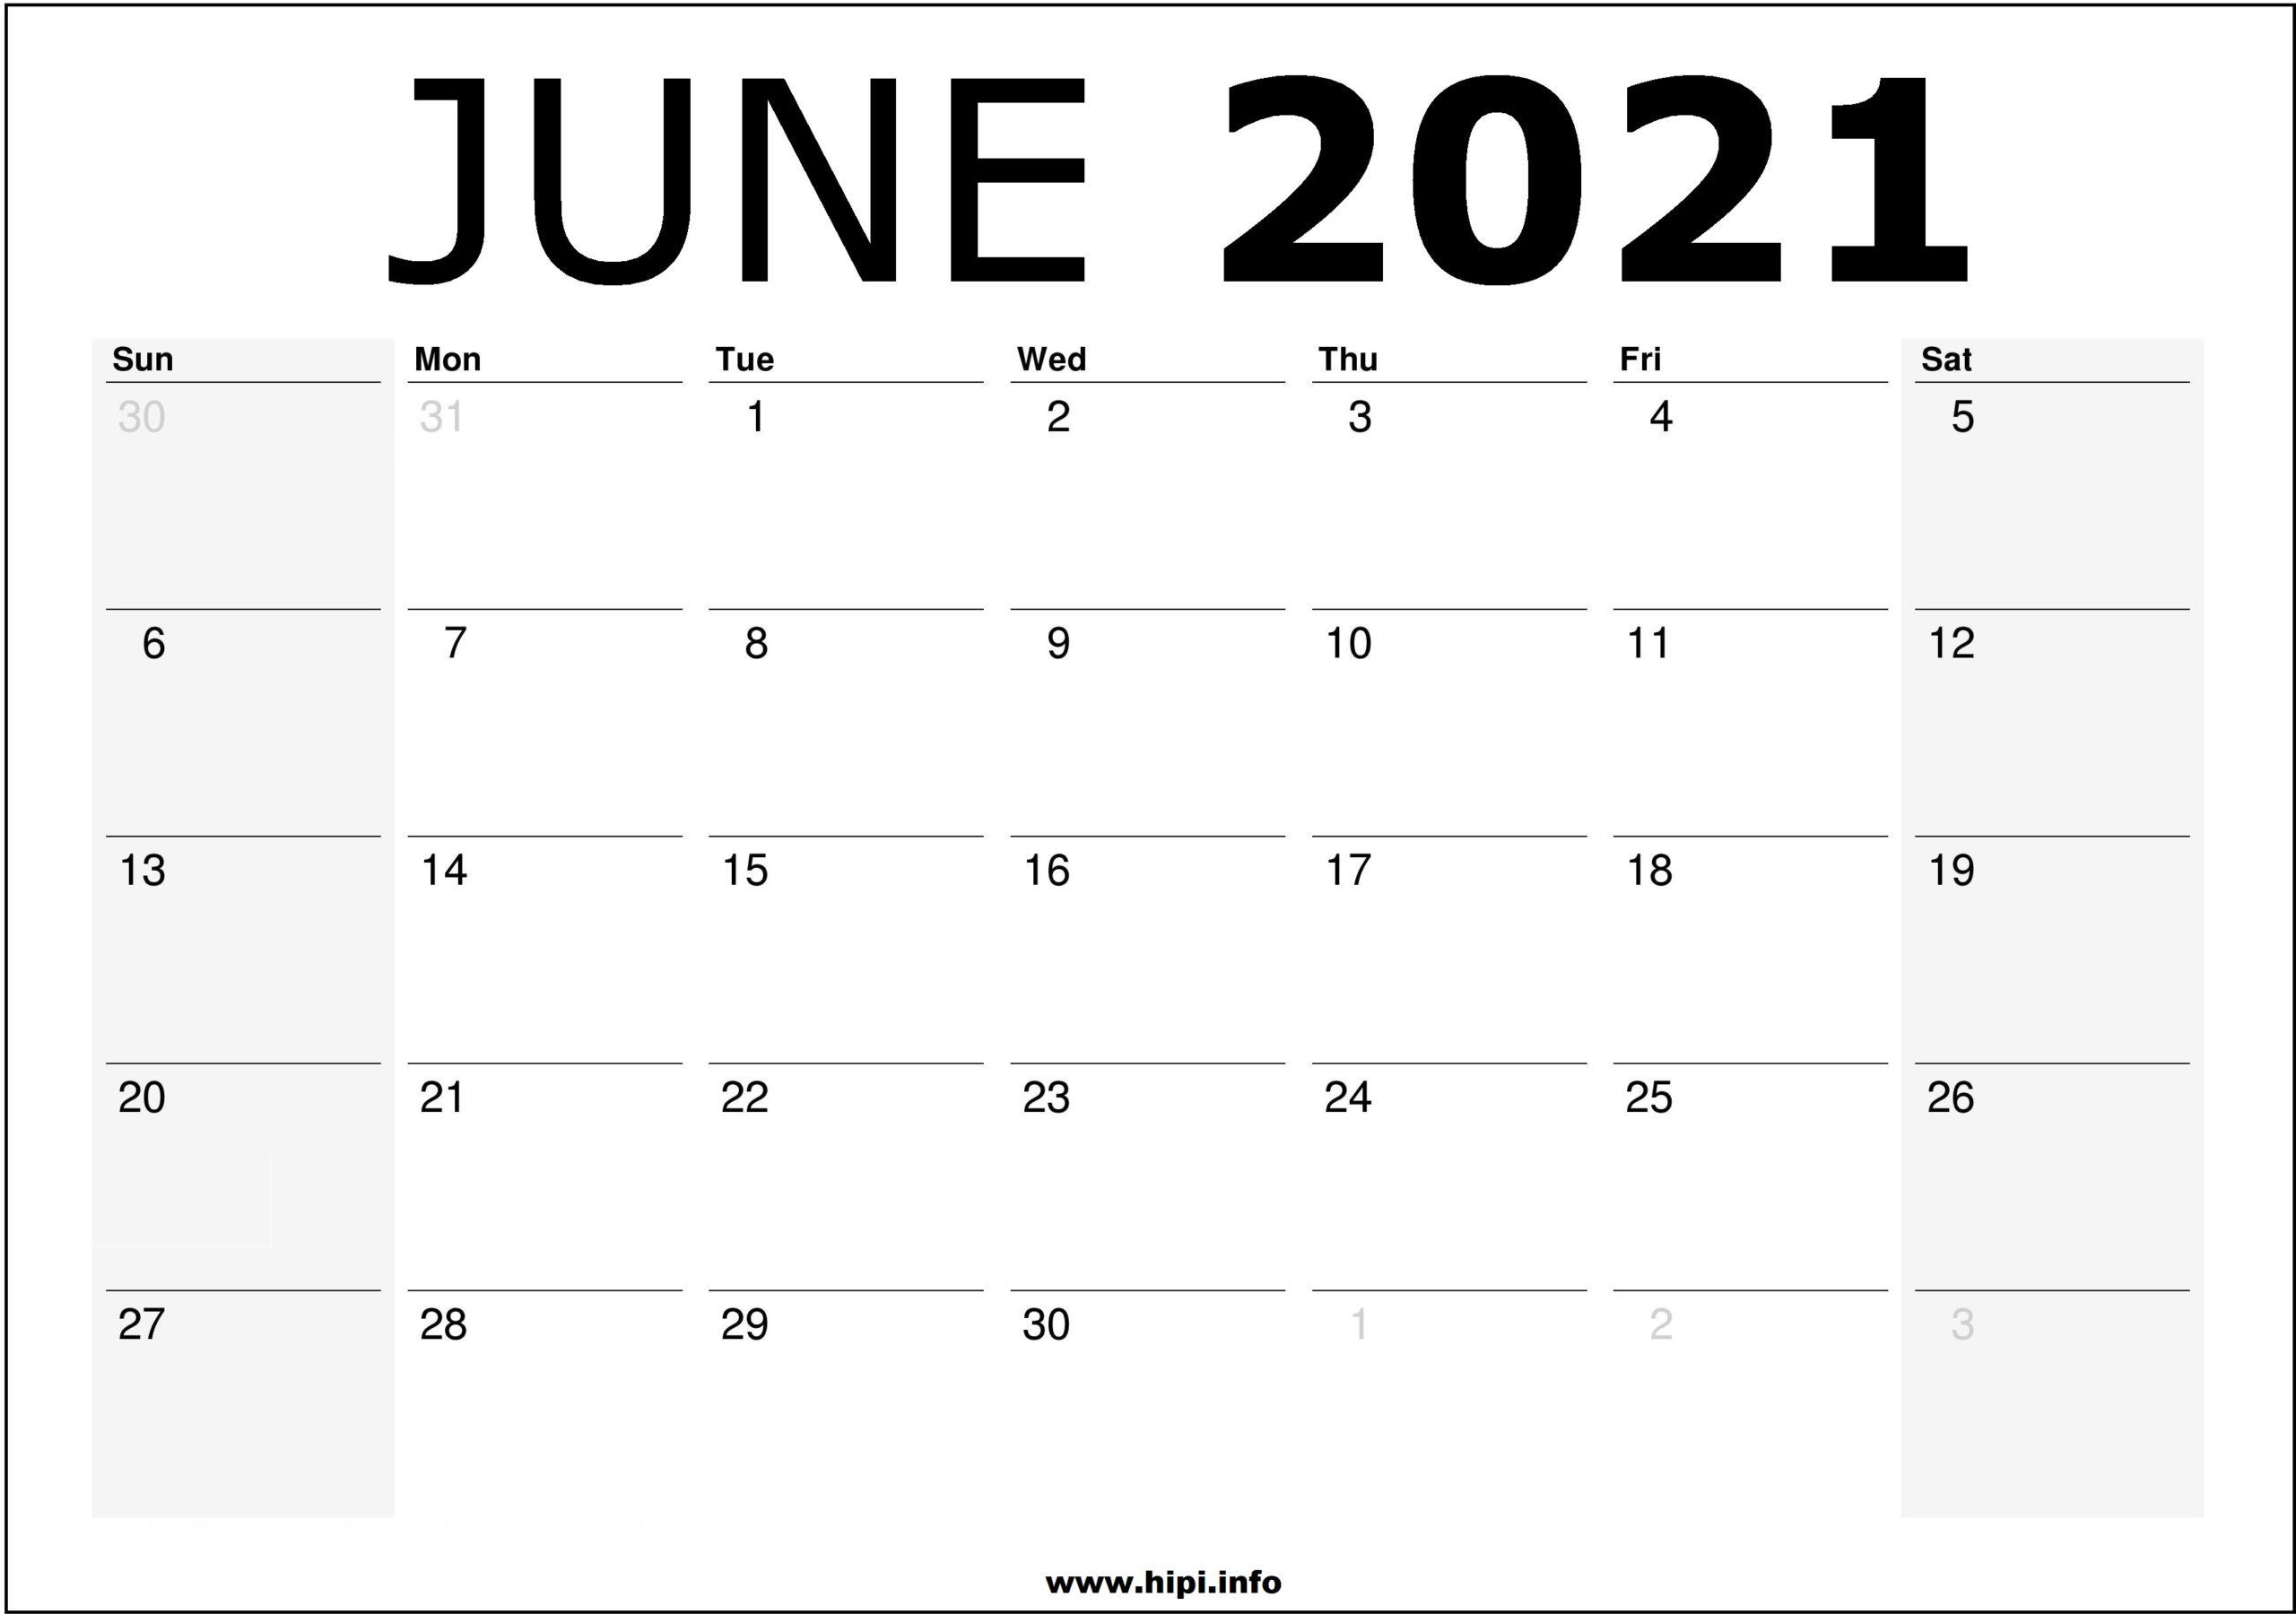 June 2021 Calendar Printable – Monthly Calendar Free ...